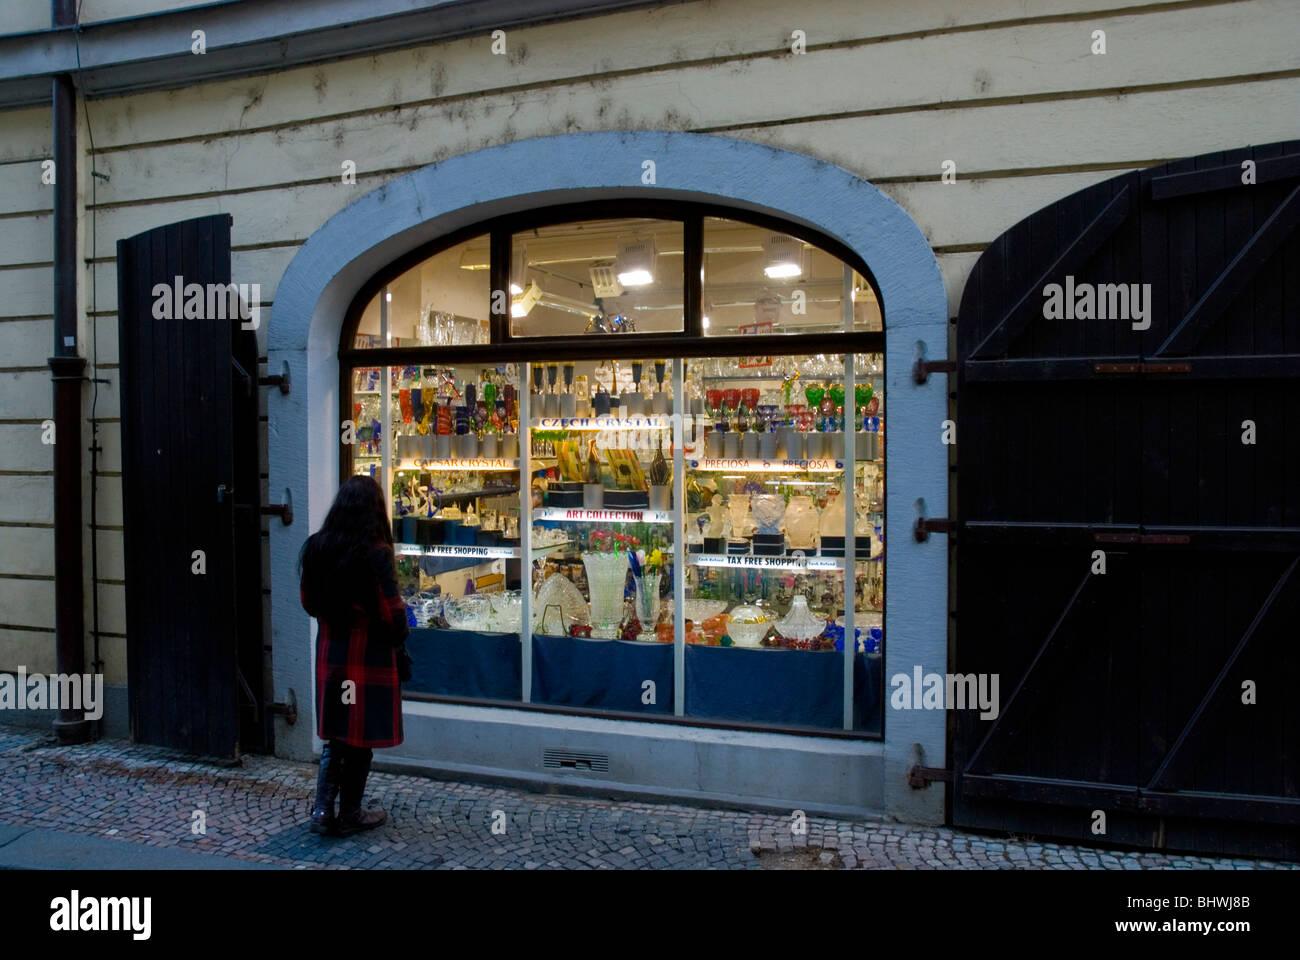 Glaswaren Shop Josefska Straße Mala Strana Prag Tschechien Mitteleuropa Stockbild